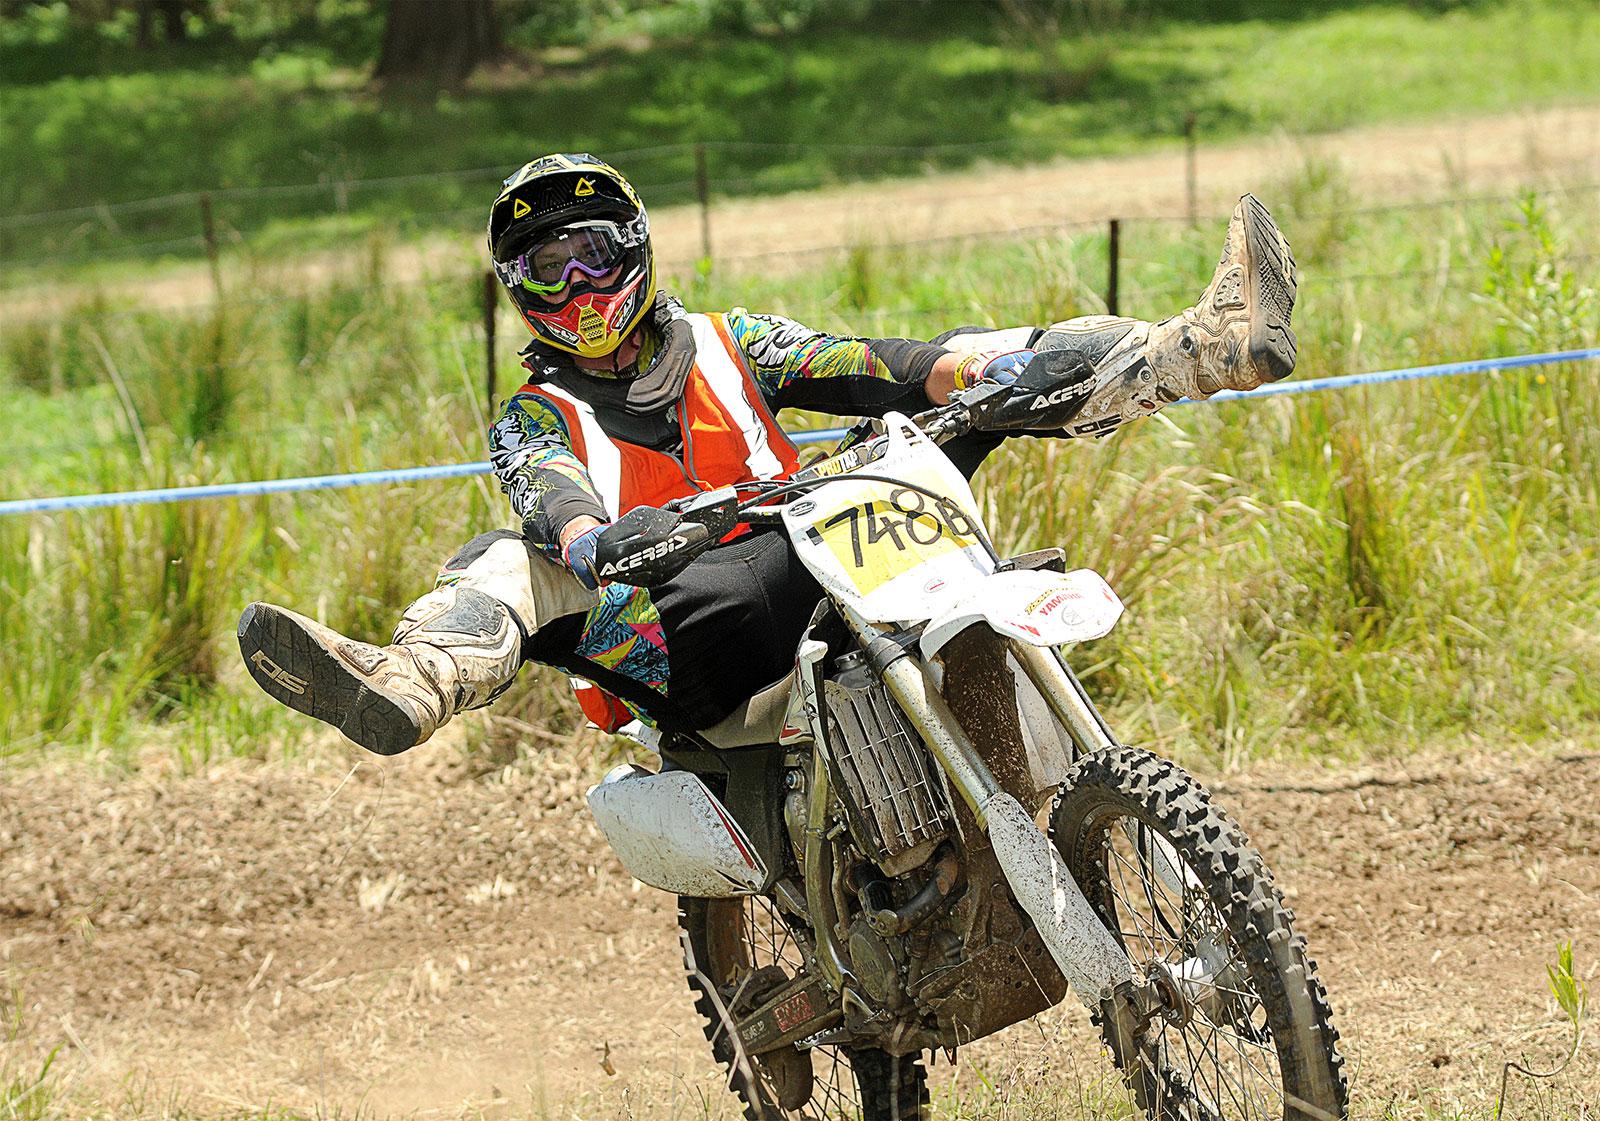 "Zeke Klibbe having a blast on his dirt bike.       Normal   0           false   false   false     EN-US   X-NONE   X-NONE                                                                                                                                                                                                                                                                                                                                                                                                                                                                                                                                                                                                                                                                                                                                                                                                                                                                     /* Style Definitions */  table.MsoNormalTable {mso-style-name:""Table Normal""; mso-tstyle-rowband-size:0; mso-tstyle-colband-size:0; mso-style-noshow:yes; mso-style-priority:99; mso-style-parent:""""; mso-padding-alt:0in 5.4pt 0in 5.4pt; mso-para-margin:0in; mso-para-margin-bottom:.0001pt; mso-pagination:widow-orphan; font-size:11.0pt; font-family:""Calibri"",sans-serif; mso-ascii-font-family:Calibri; mso-ascii-theme-font:minor-latin; mso-hansi-font-family:Calibri; mso-hansi-theme-font:minor-latin; mso-bidi-font-family:""Times New Roman""; mso-bidi-theme-font:minor-bidi;}"